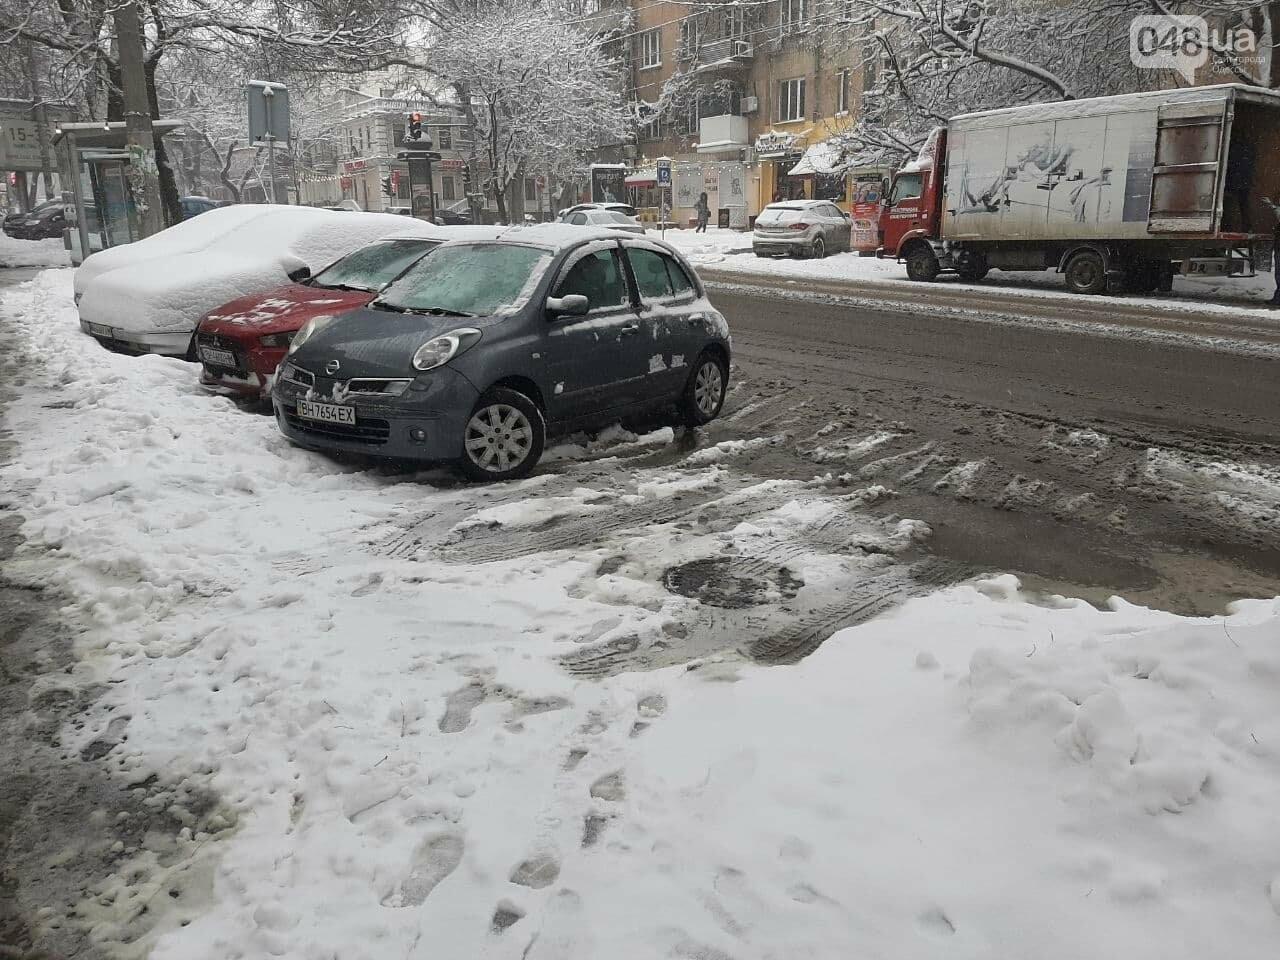 Одессу замело: ситуация на дорогах и тротуарах в городе, - ФОТО, фото-7